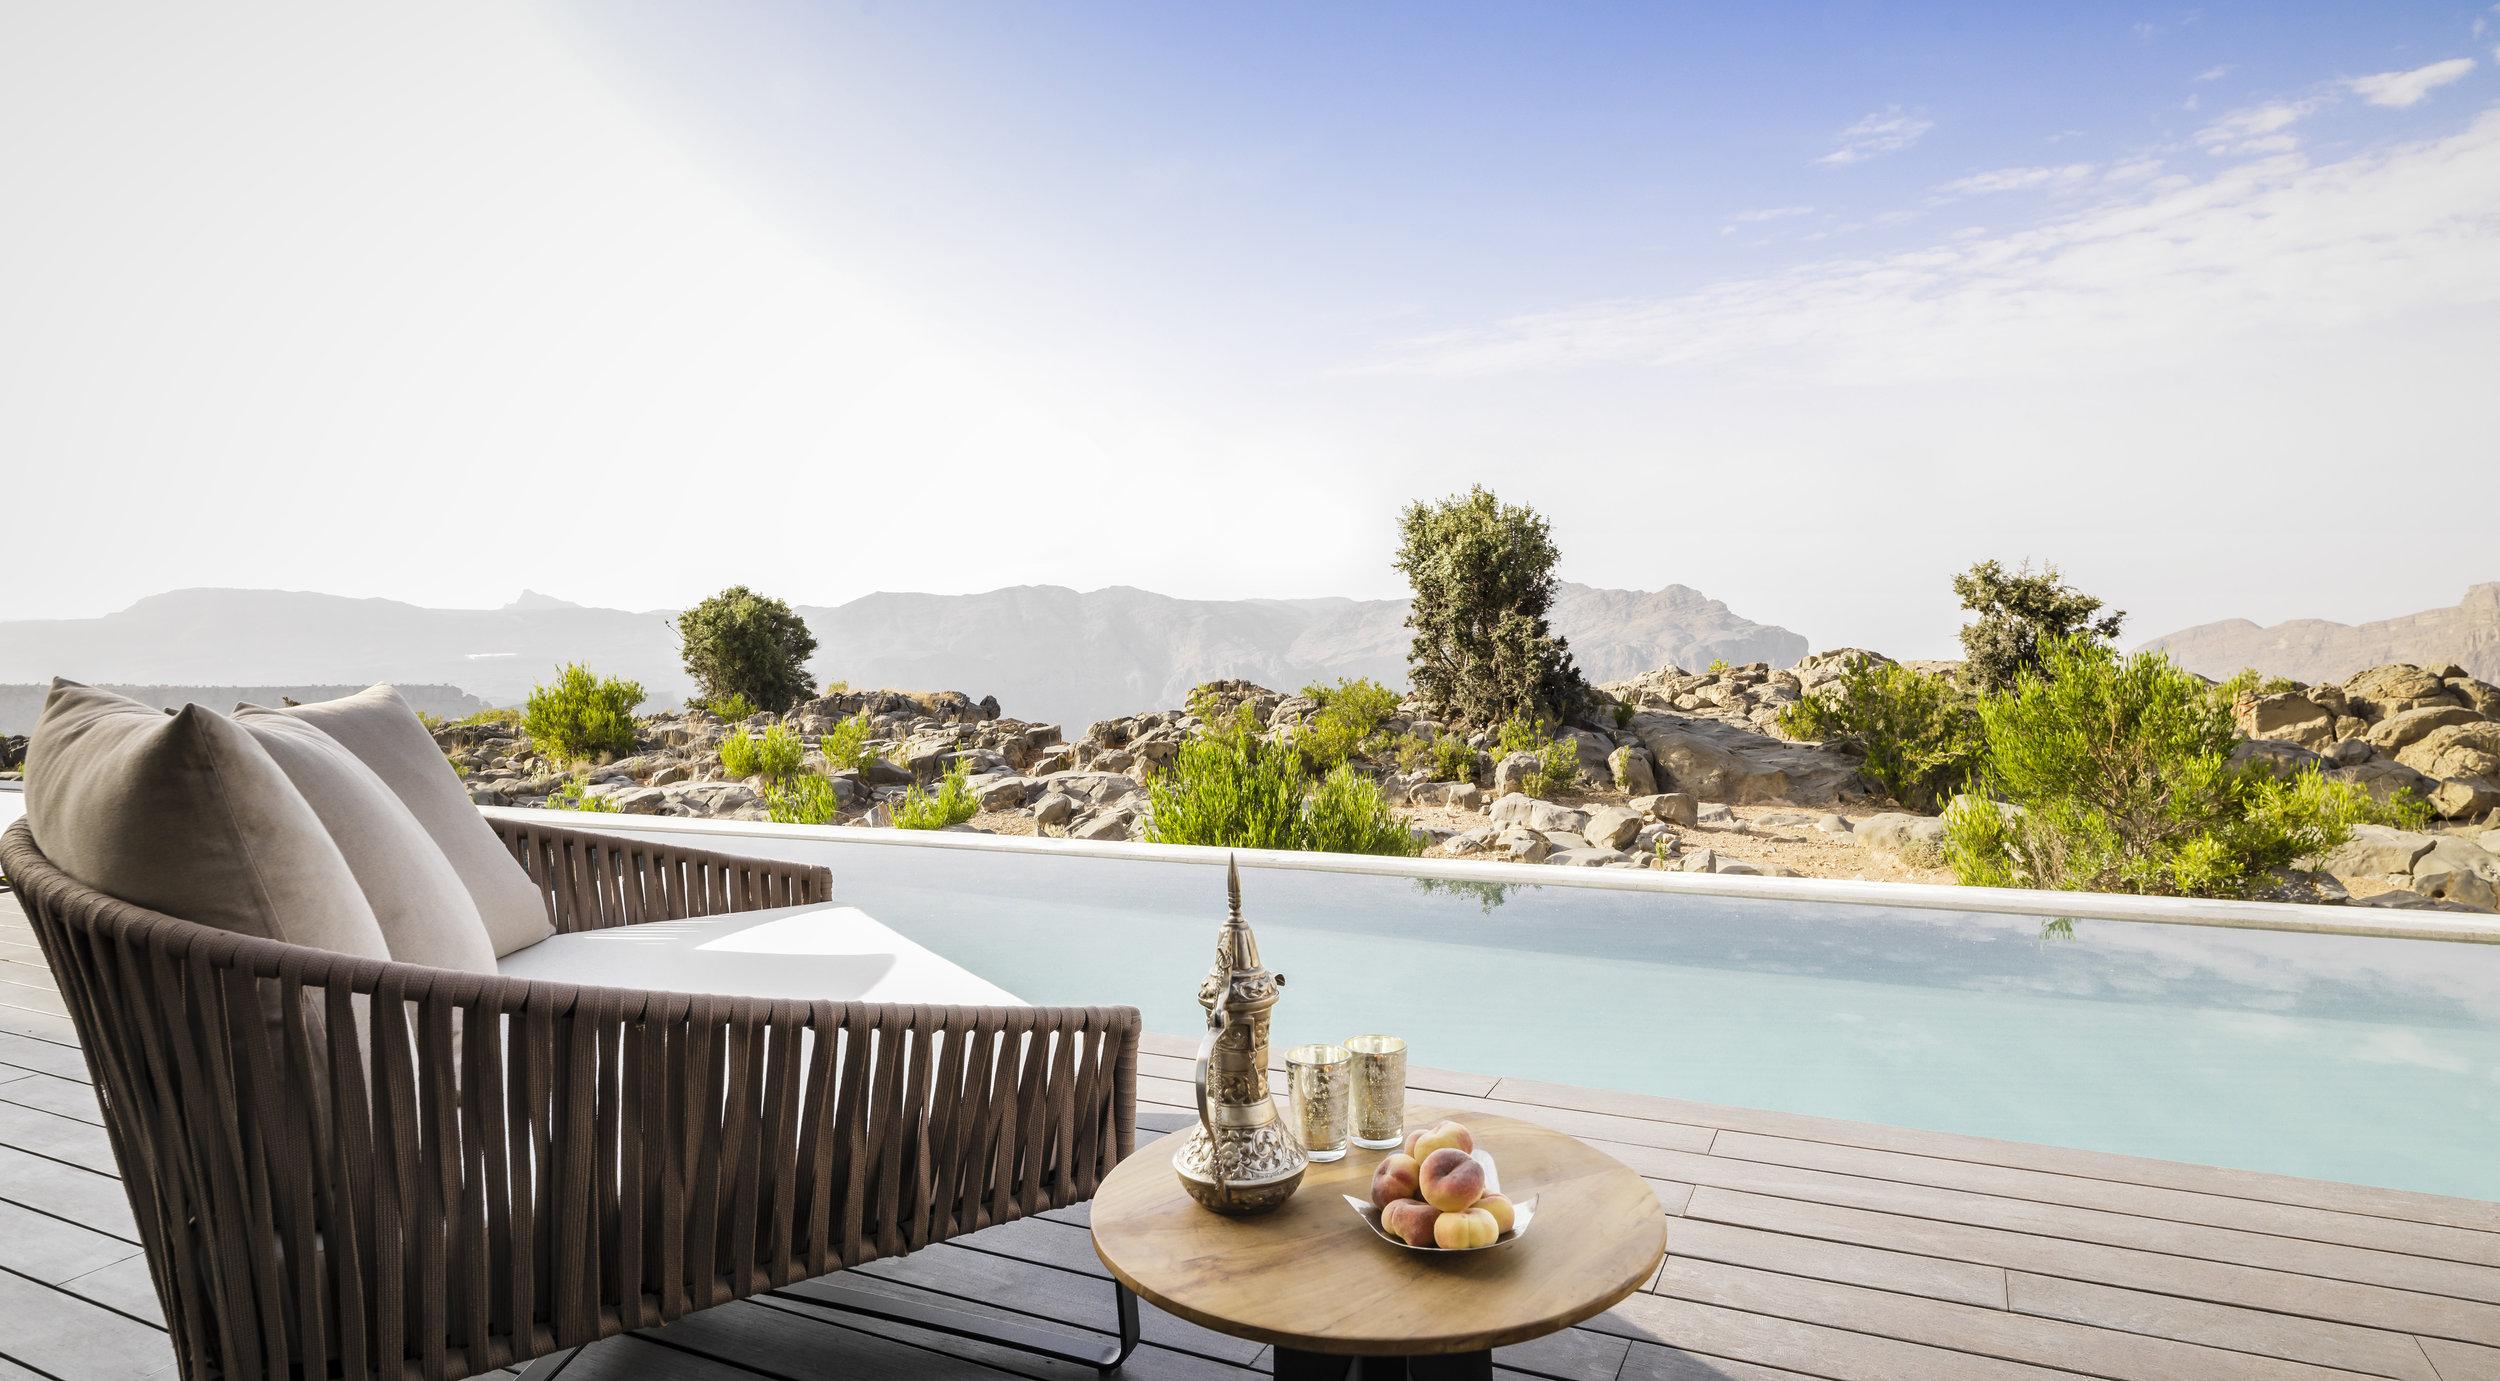 Anantara Al Jabal Al Akhdar Resort - Cliff Pool Villa Pool View 01.jpg